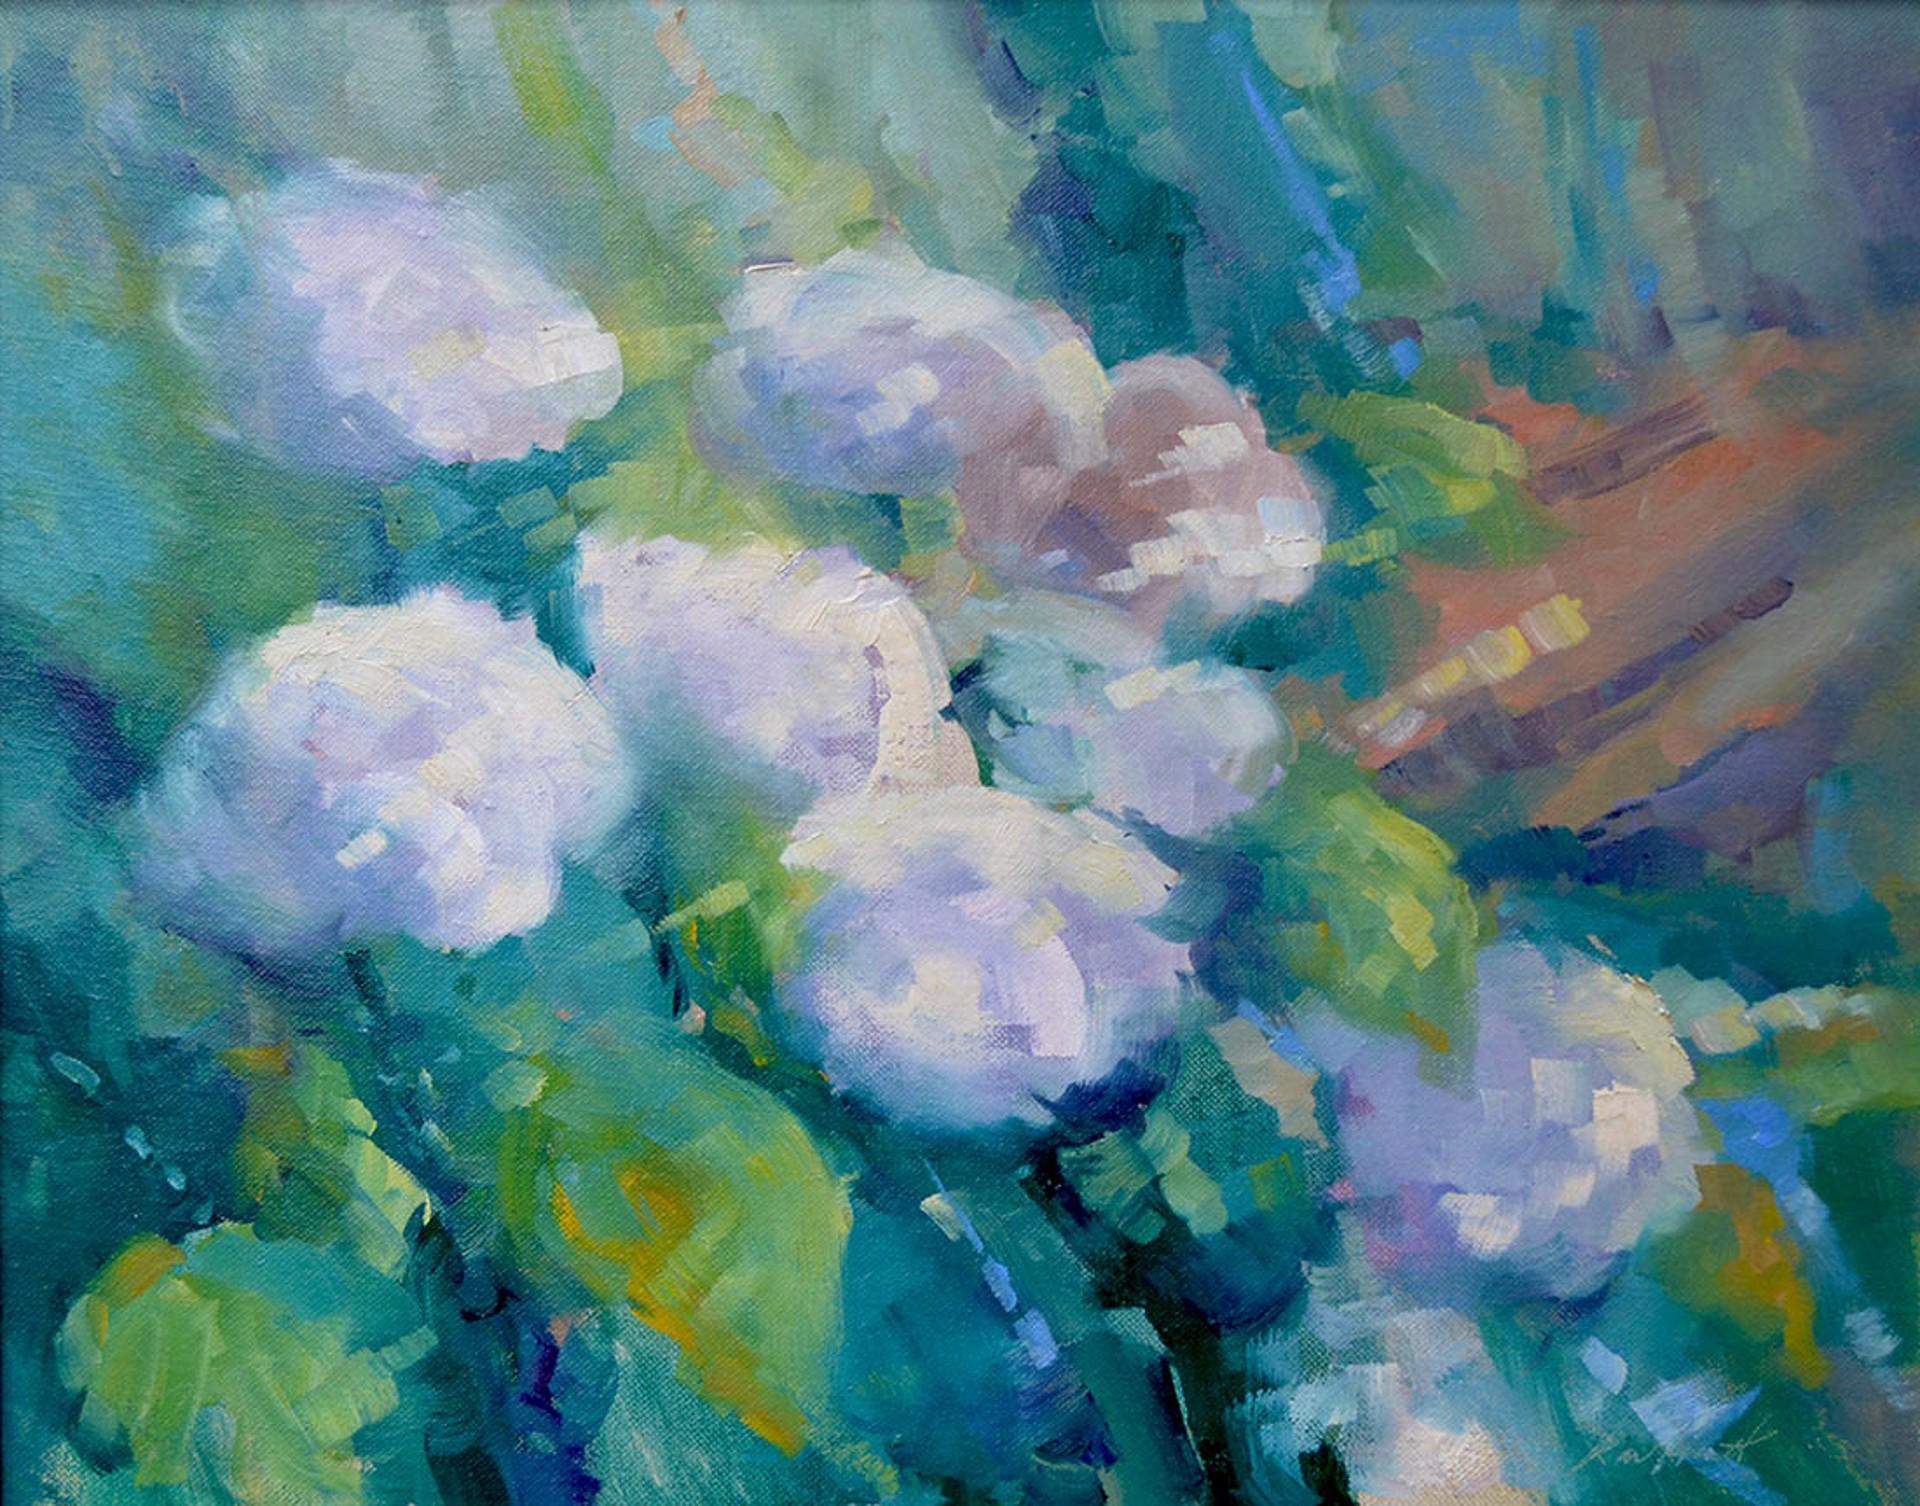 The White Hydrangeas by Karen Hewitt Hagan